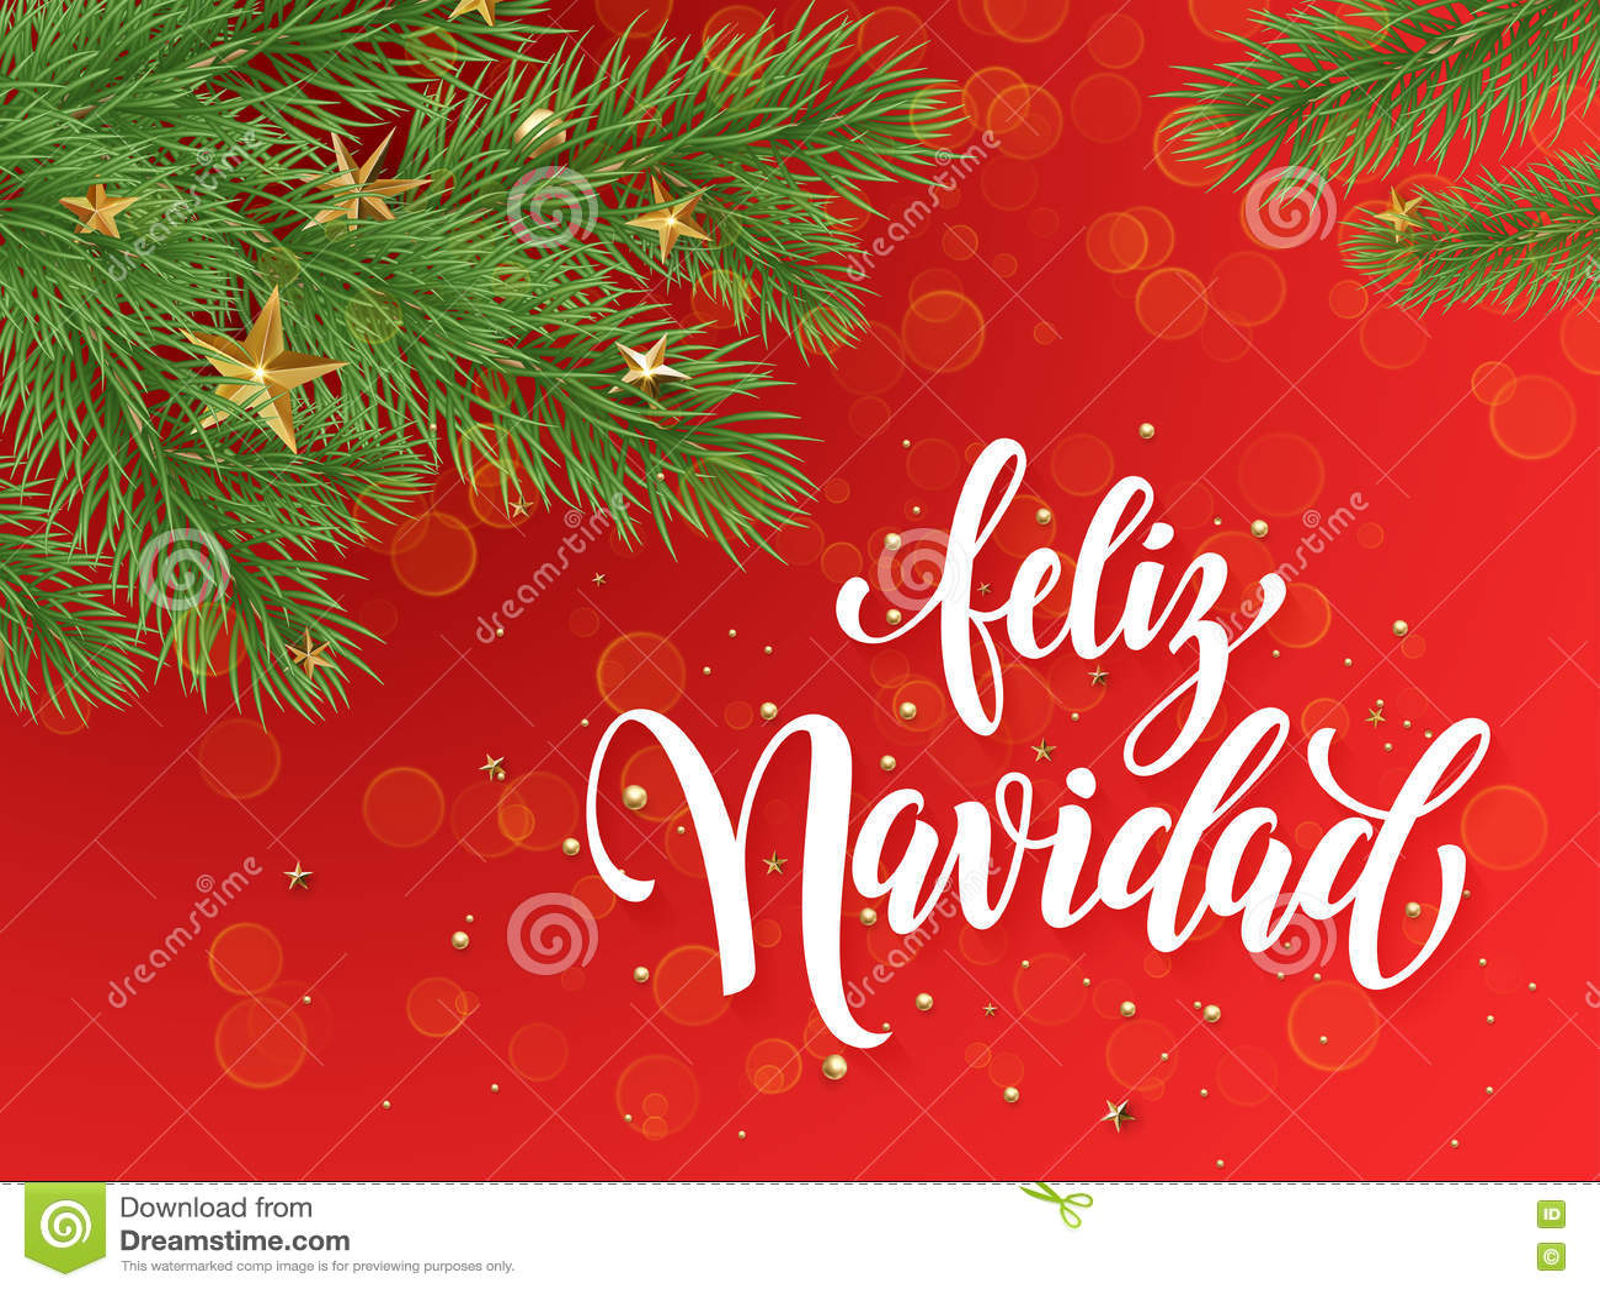 Spanish Merry Christmas Feliz Navidad Greeting Card Decoration Red